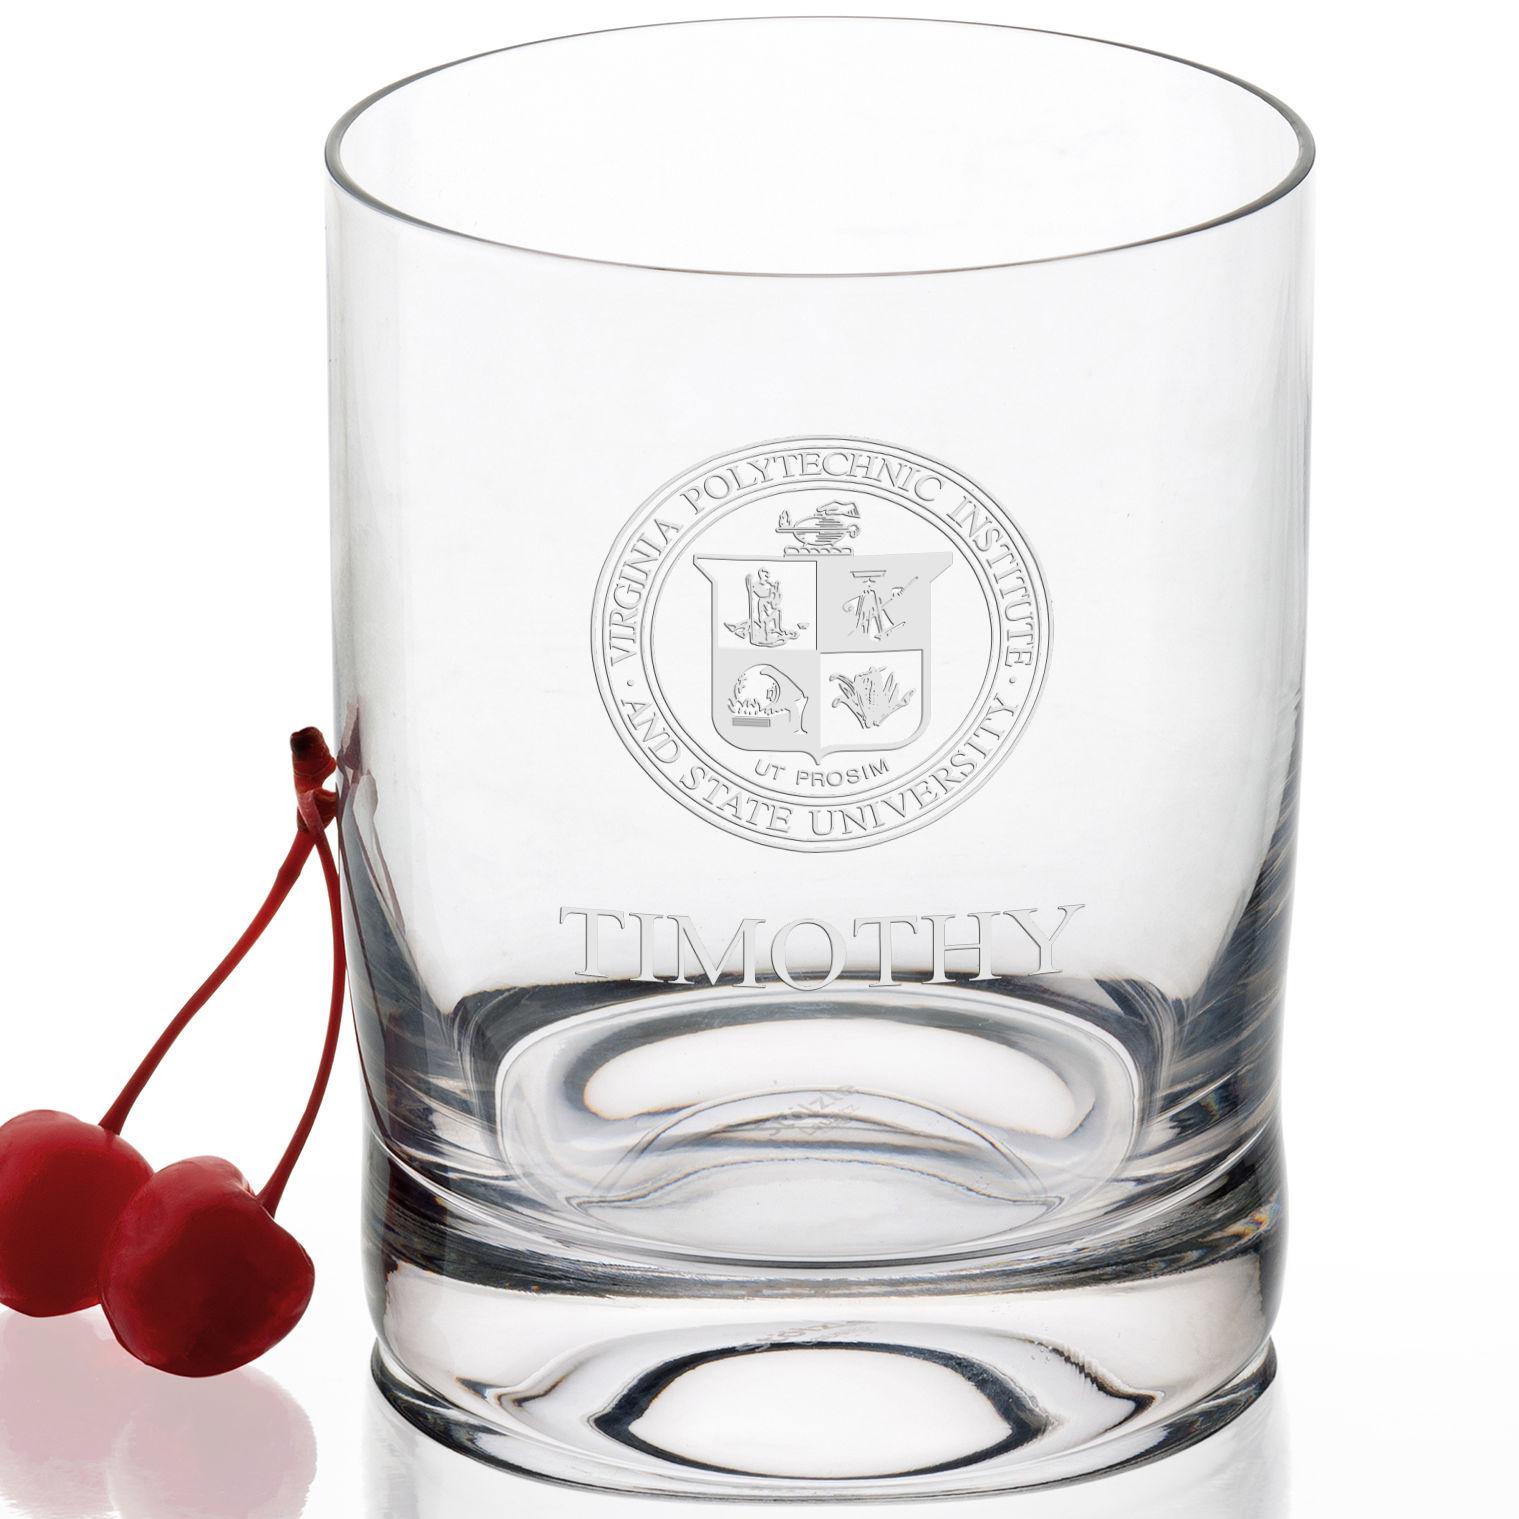 Virginia Tech Tumbler Glasses - Set of 4 - Image 2